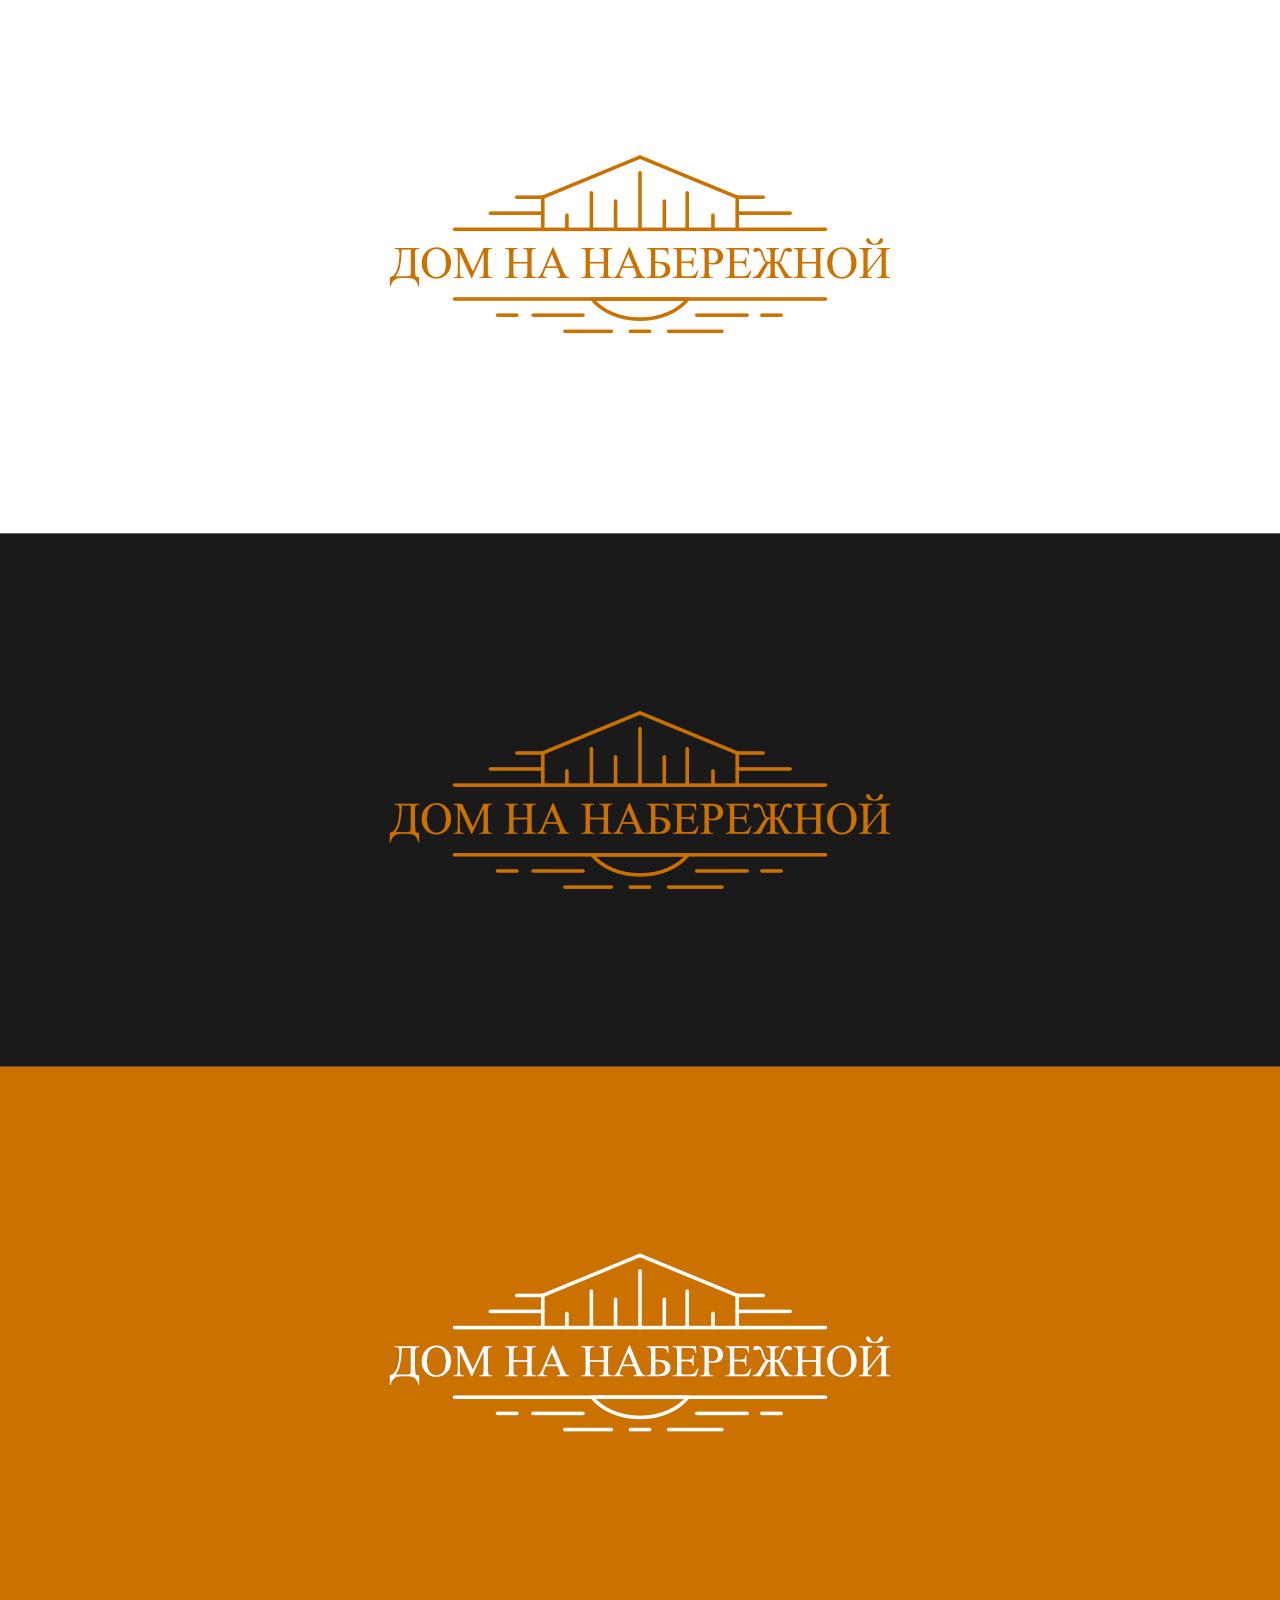 РАЗРАБОТКА логотипа для ЖИЛОГО КОМПЛЕКСА премиум В АНАПЕ.  фото f_3135deb95ad1bc0f.jpg